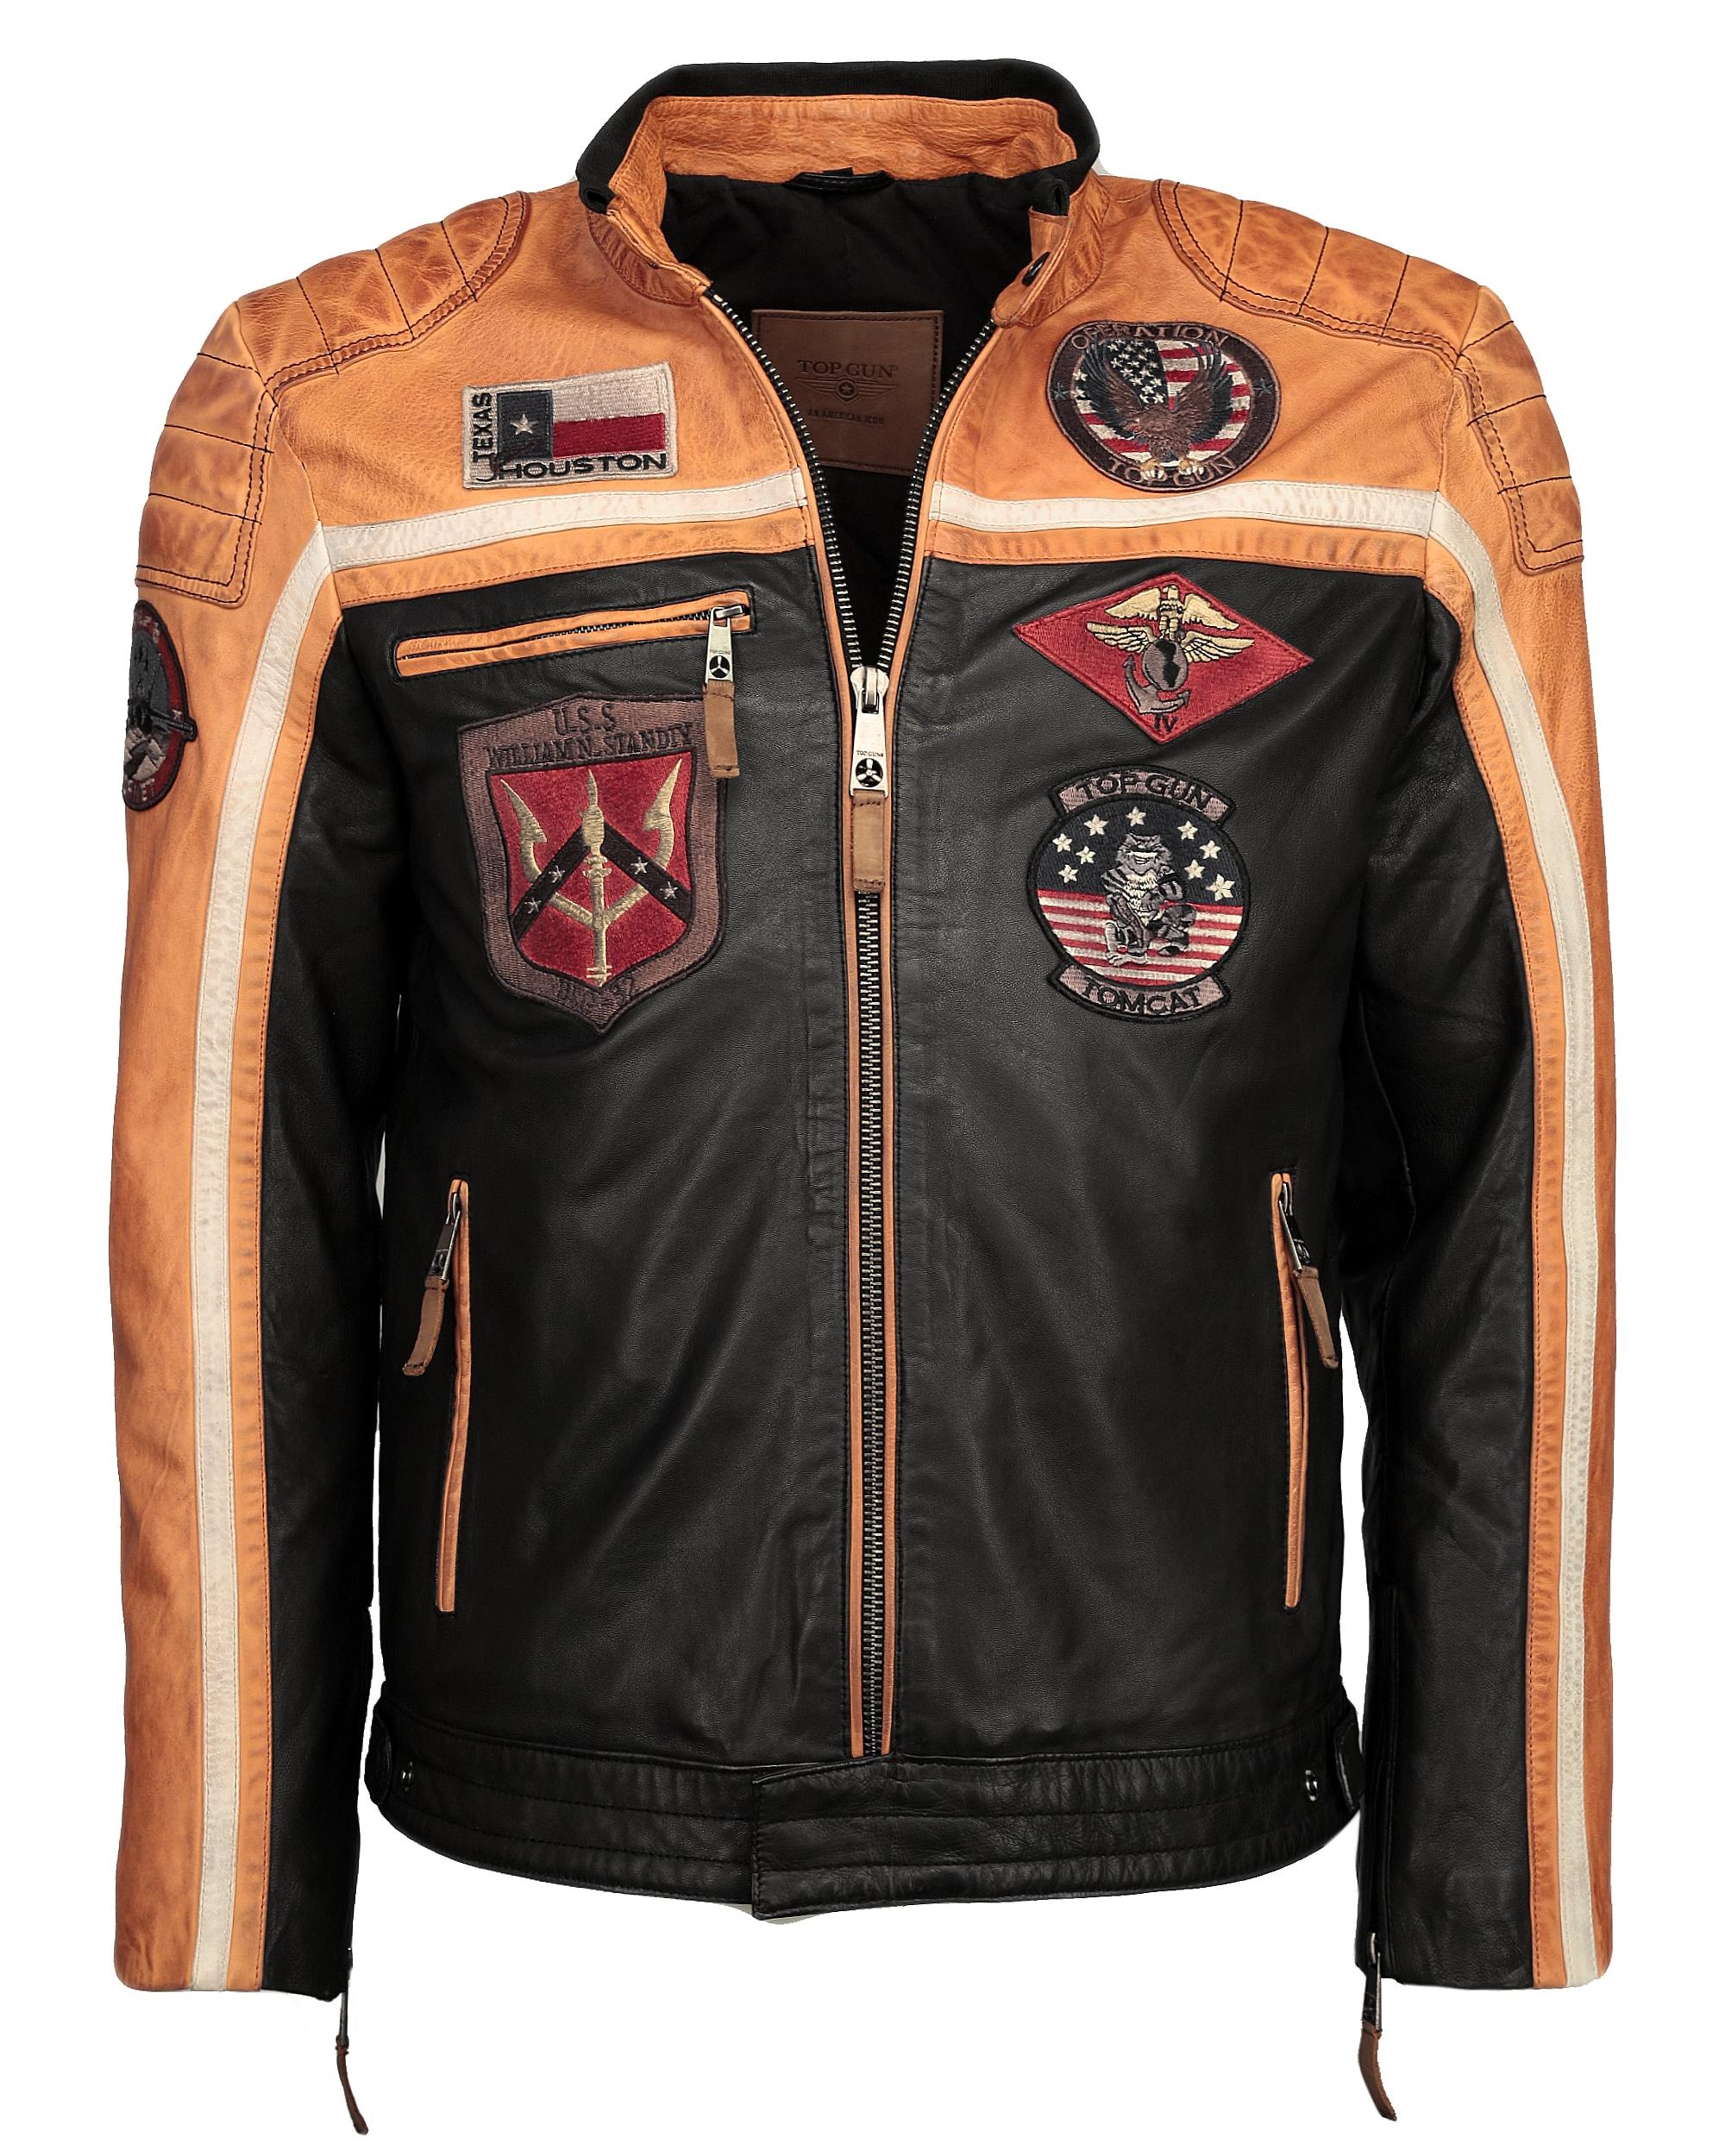 TOP GUN Bikerjacke TG-1005   Bekleidung > Jacken > Bikerjacken   Orange   Top Gun